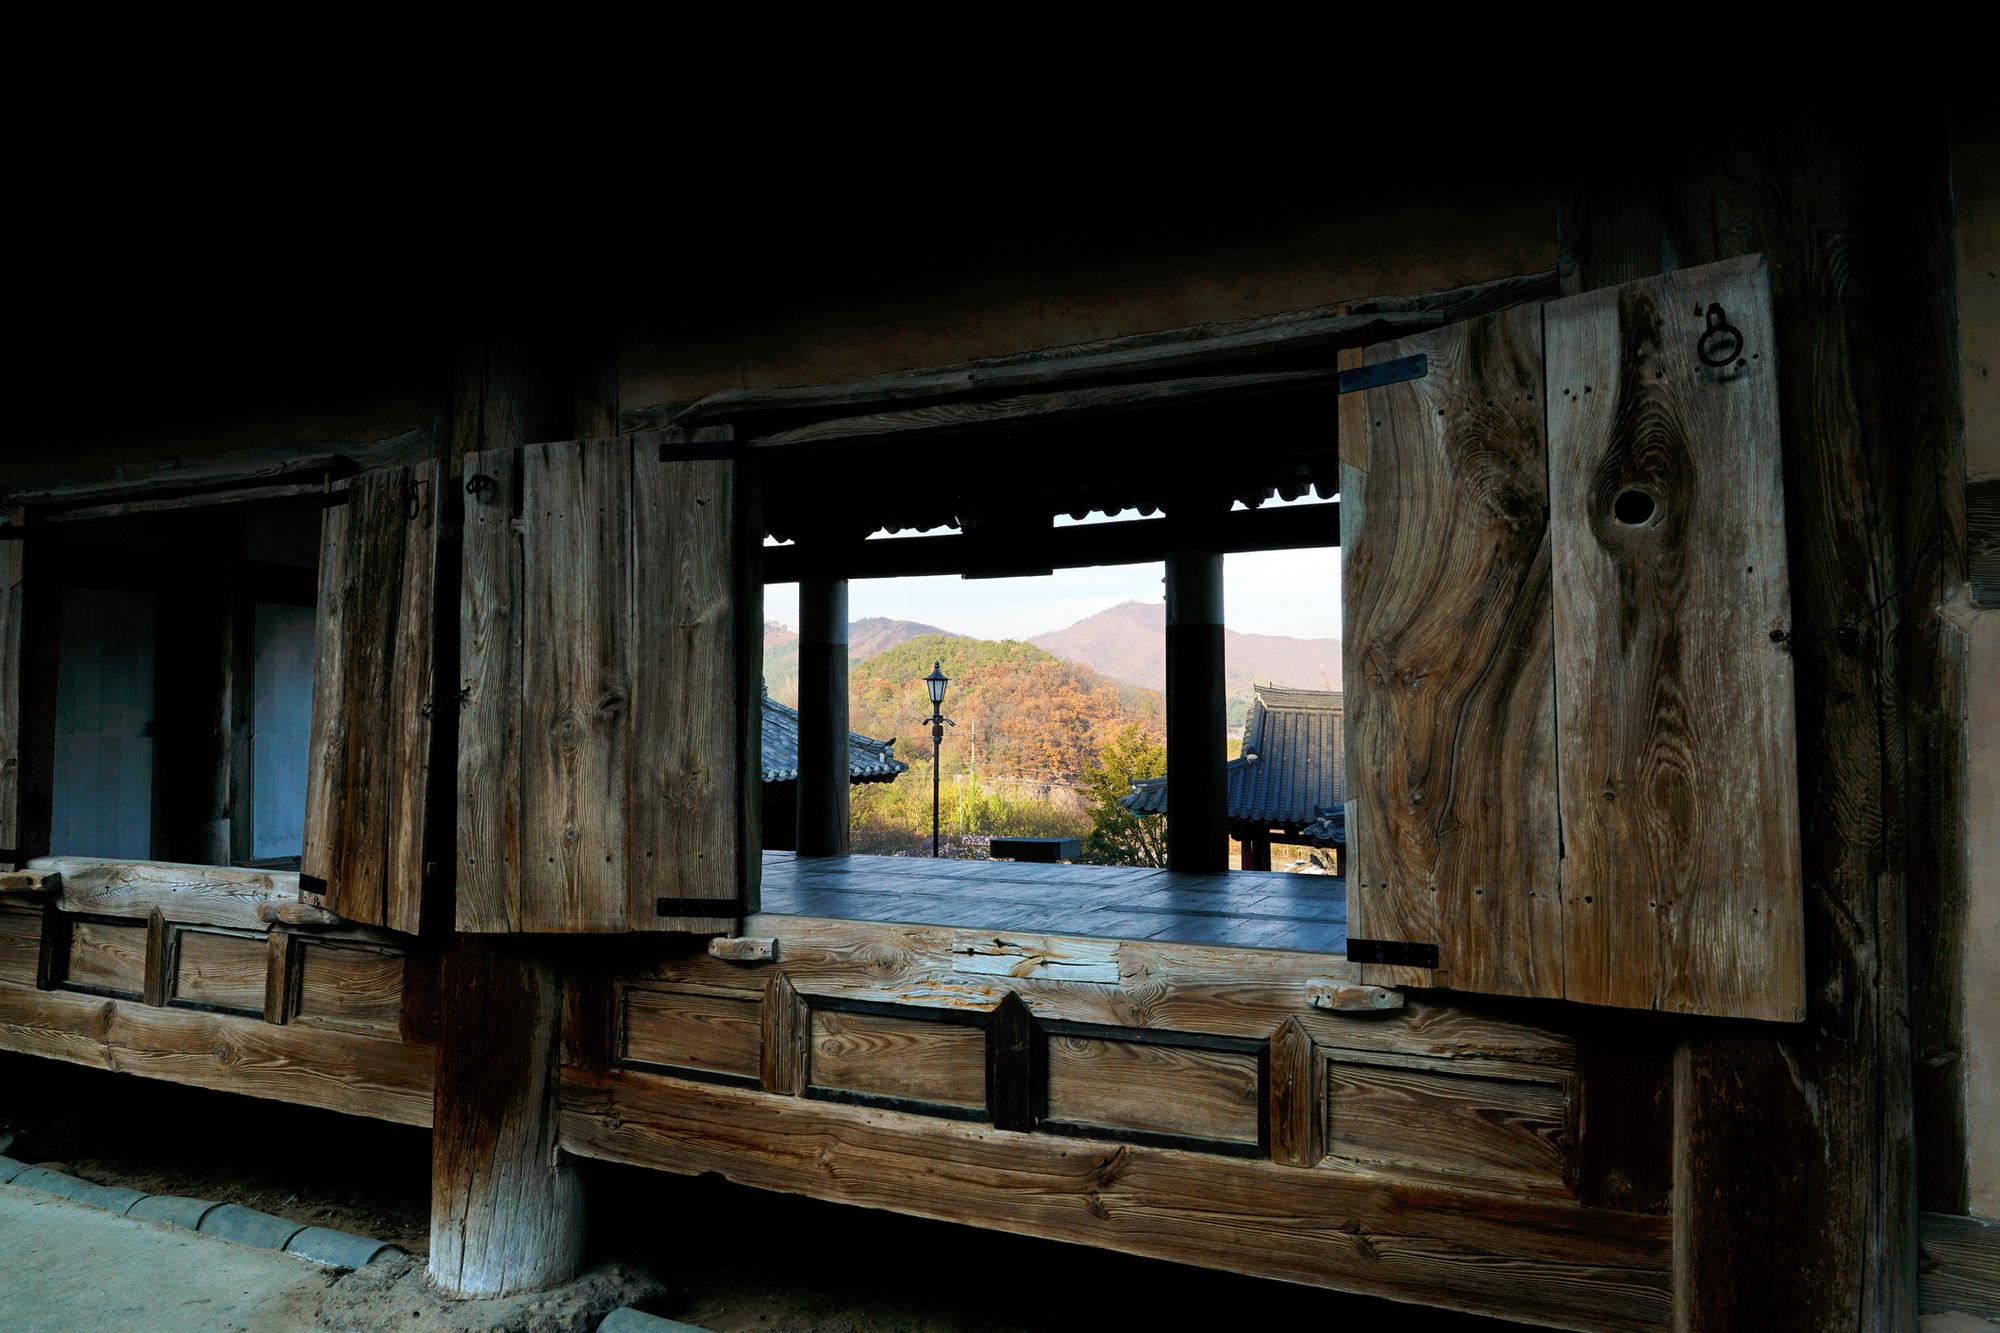 Binnenin een Seowon-academie in Zuid-korea, Getty